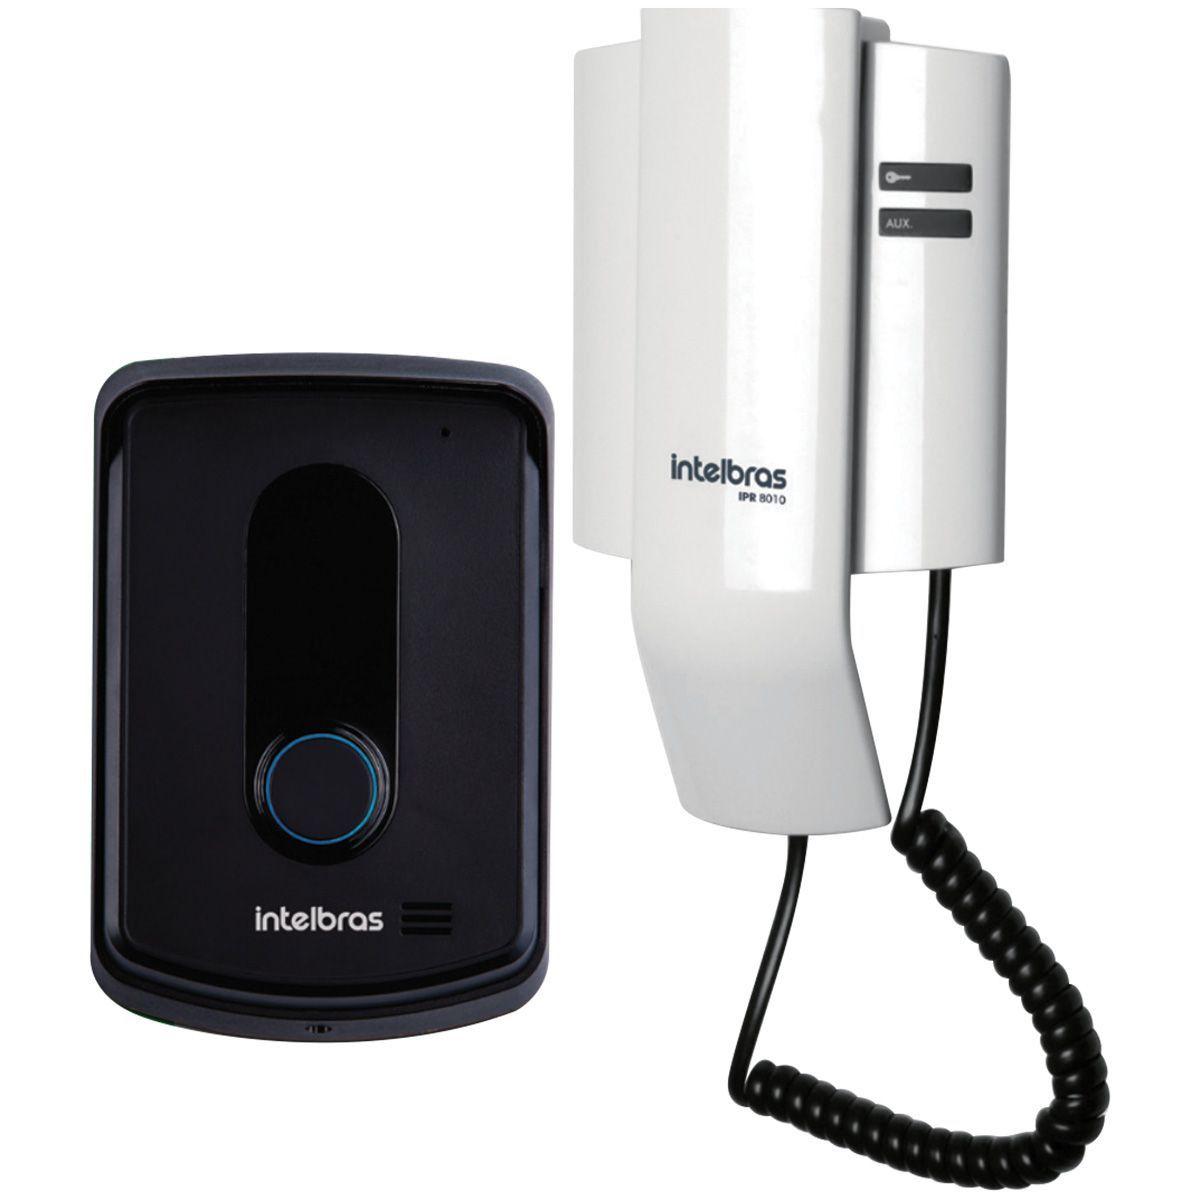 Interfone Residencial Porteiro Eletrônico Ipr 8010 Intelbras